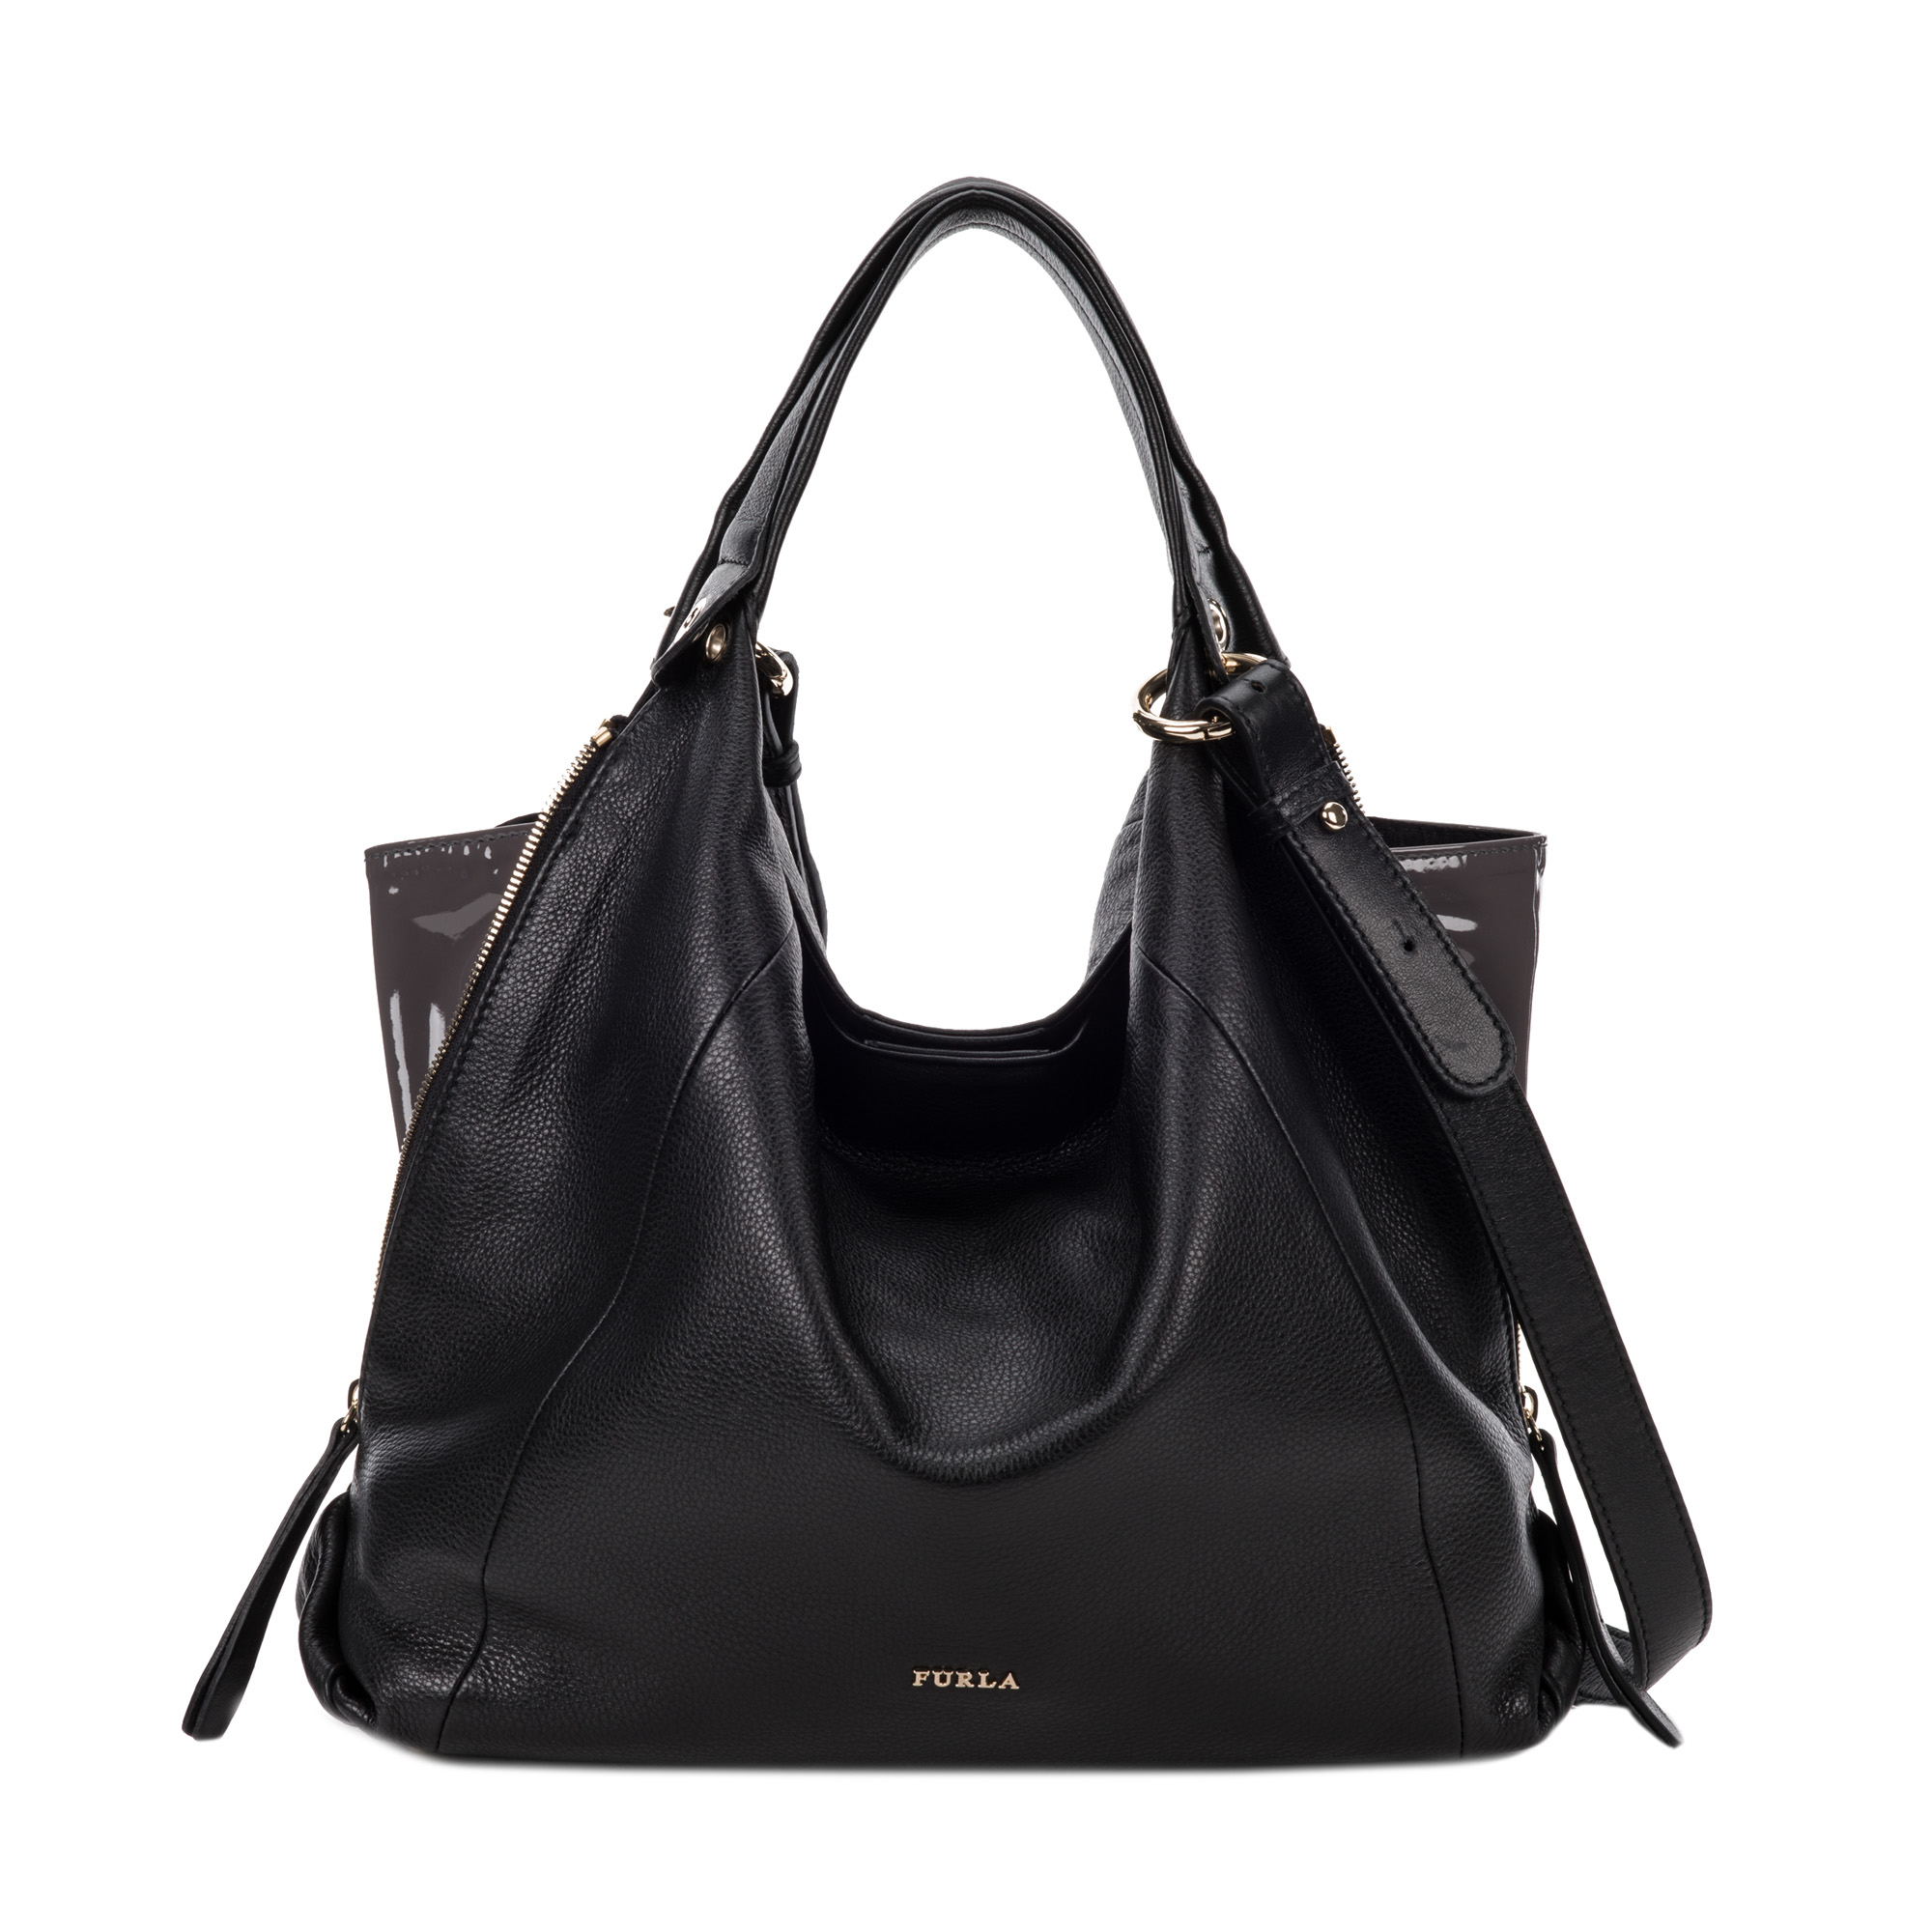 Furla Elisabeth Hobo Bag in Black (onyx